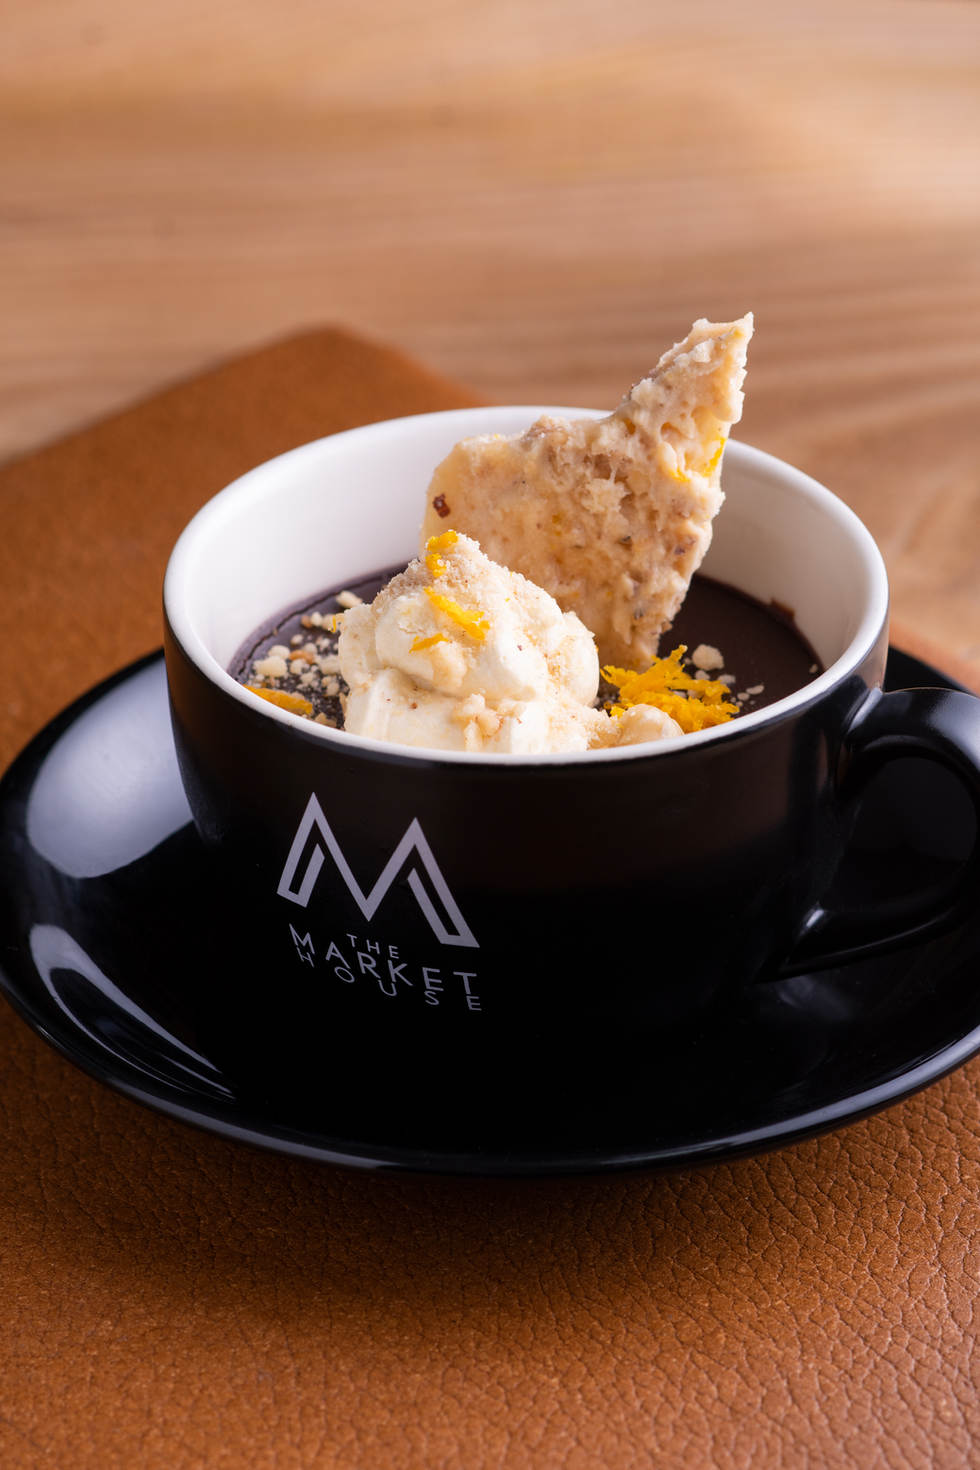 Desserts & Coffee